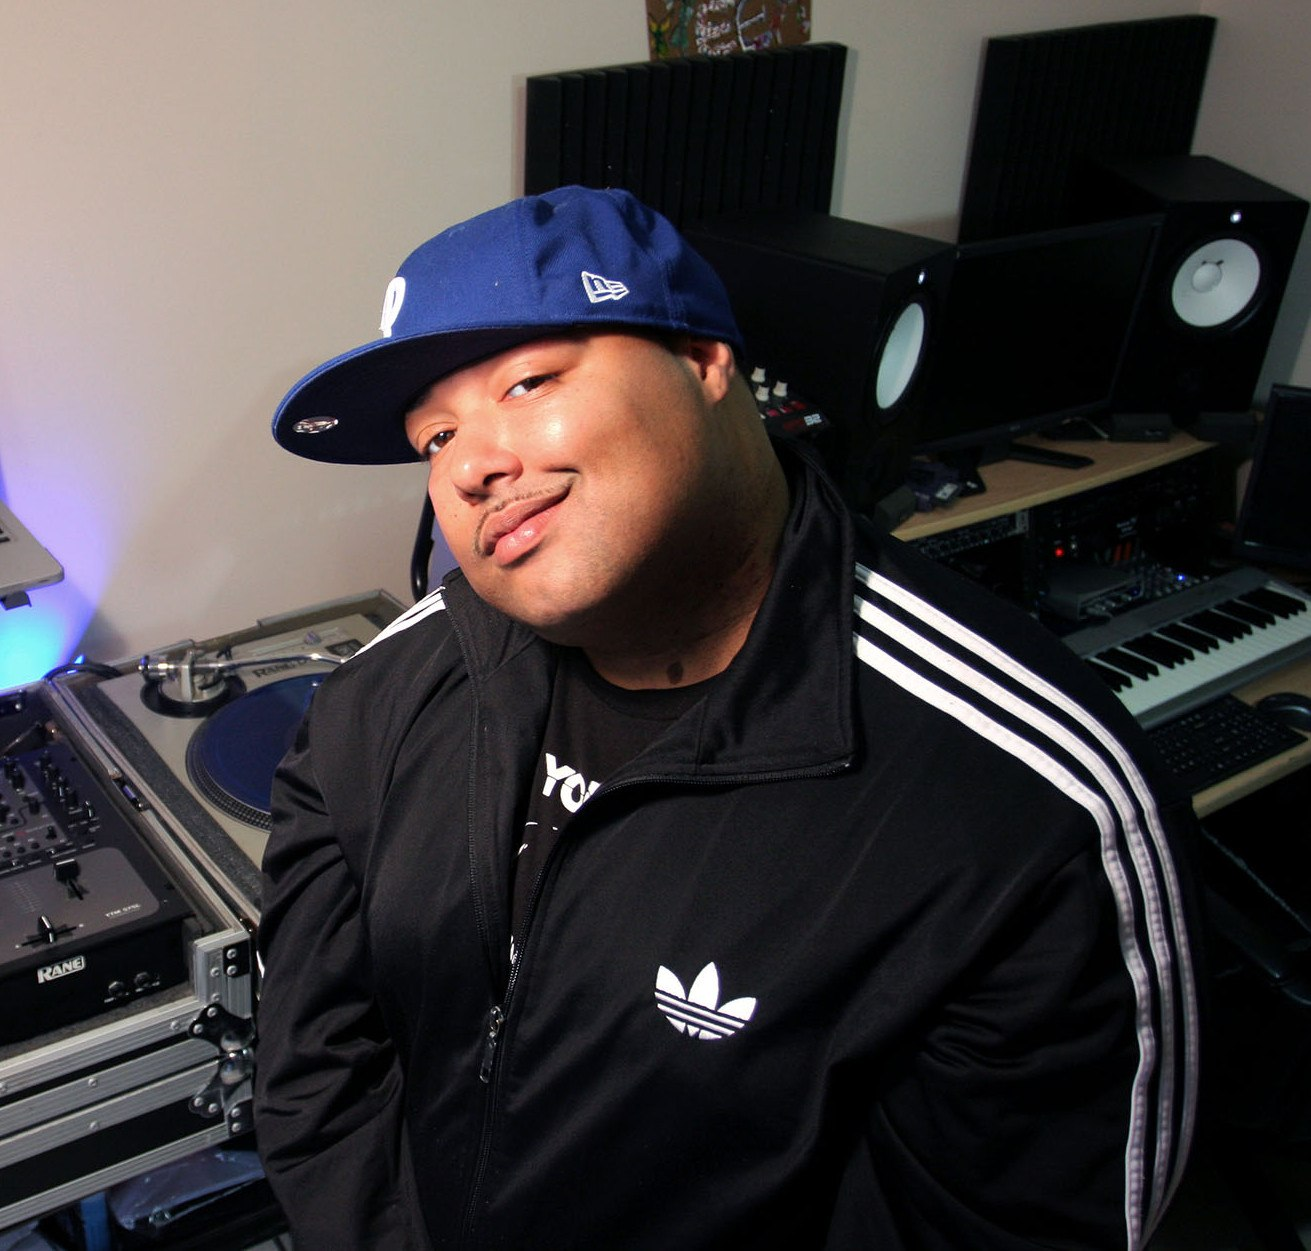 dj_dramadik_adidas_laptop_studio_phillies_hat_blue